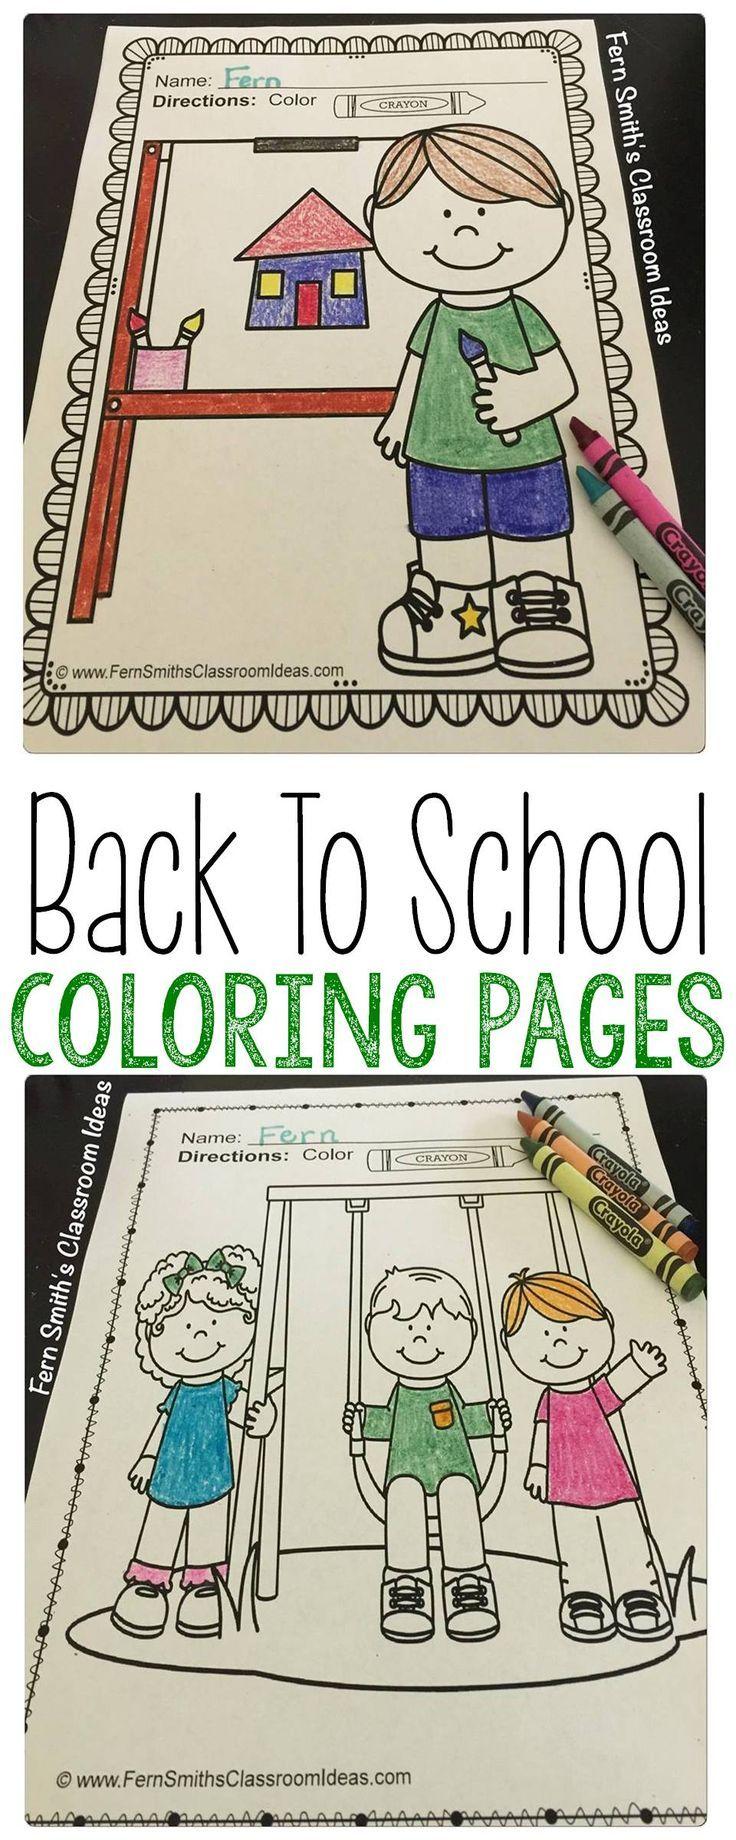 Ba ba back to school coloring sheets printable - Back To School Coloring Pages